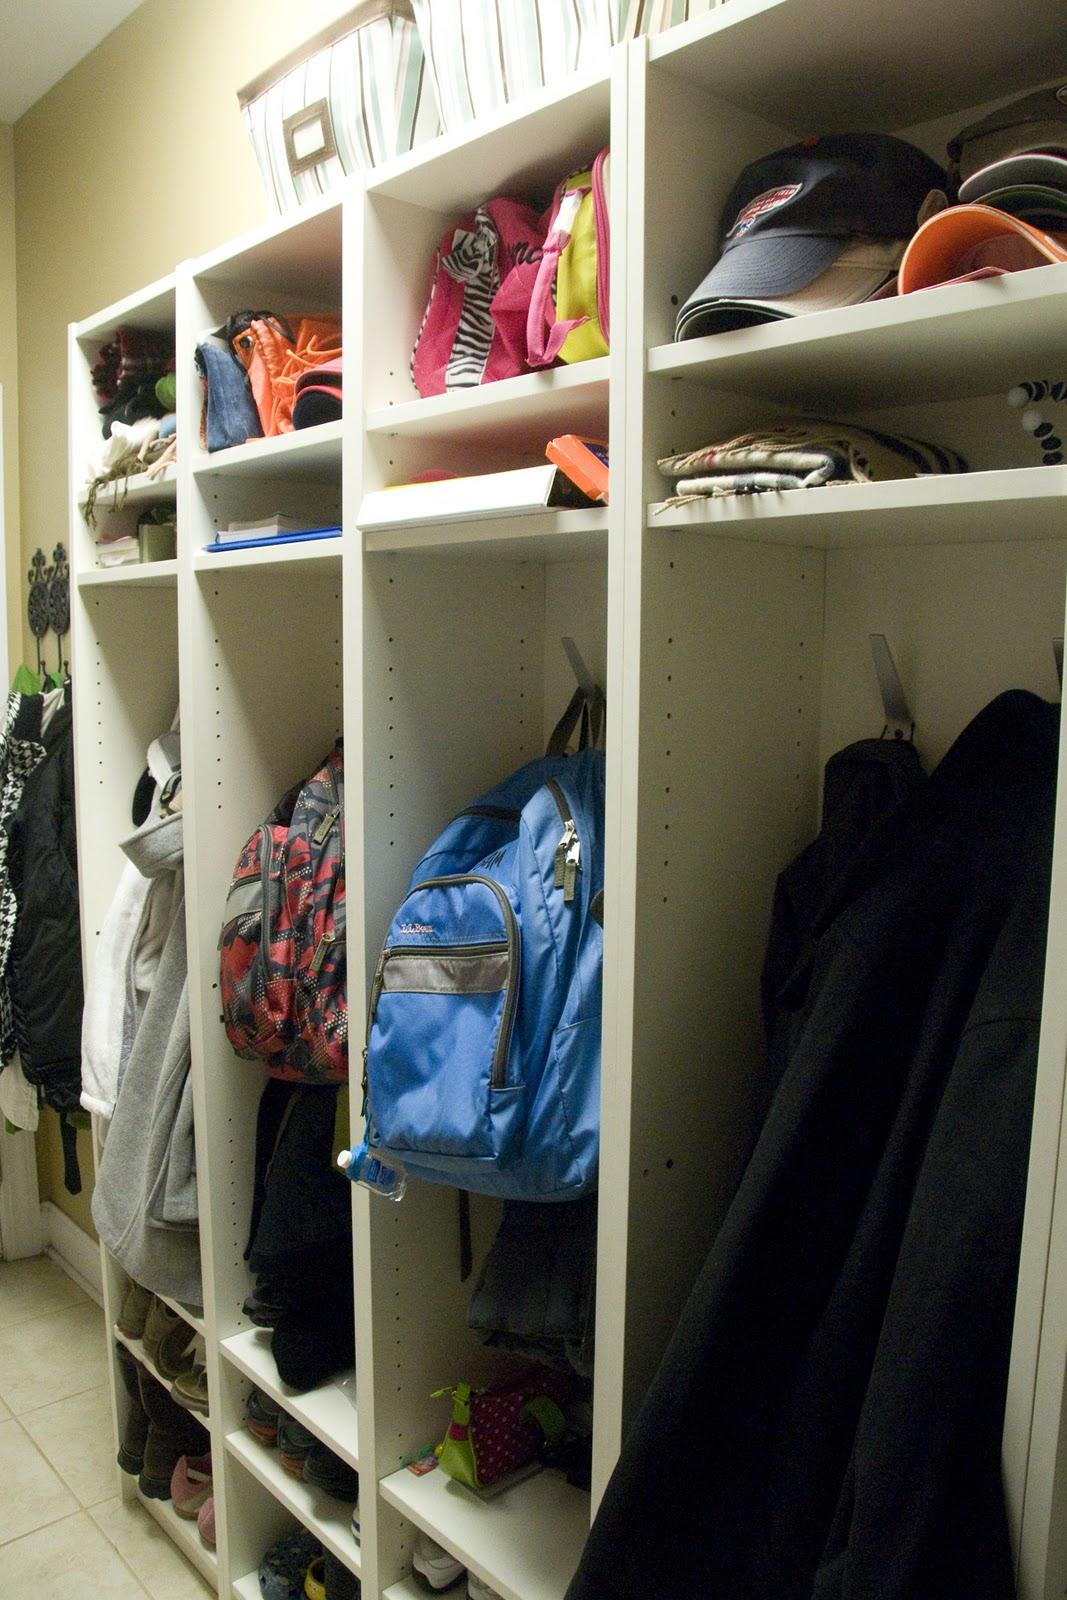 Mudroom Storage Lockers Ikea : Make your own mud room lockers the polkadot chair